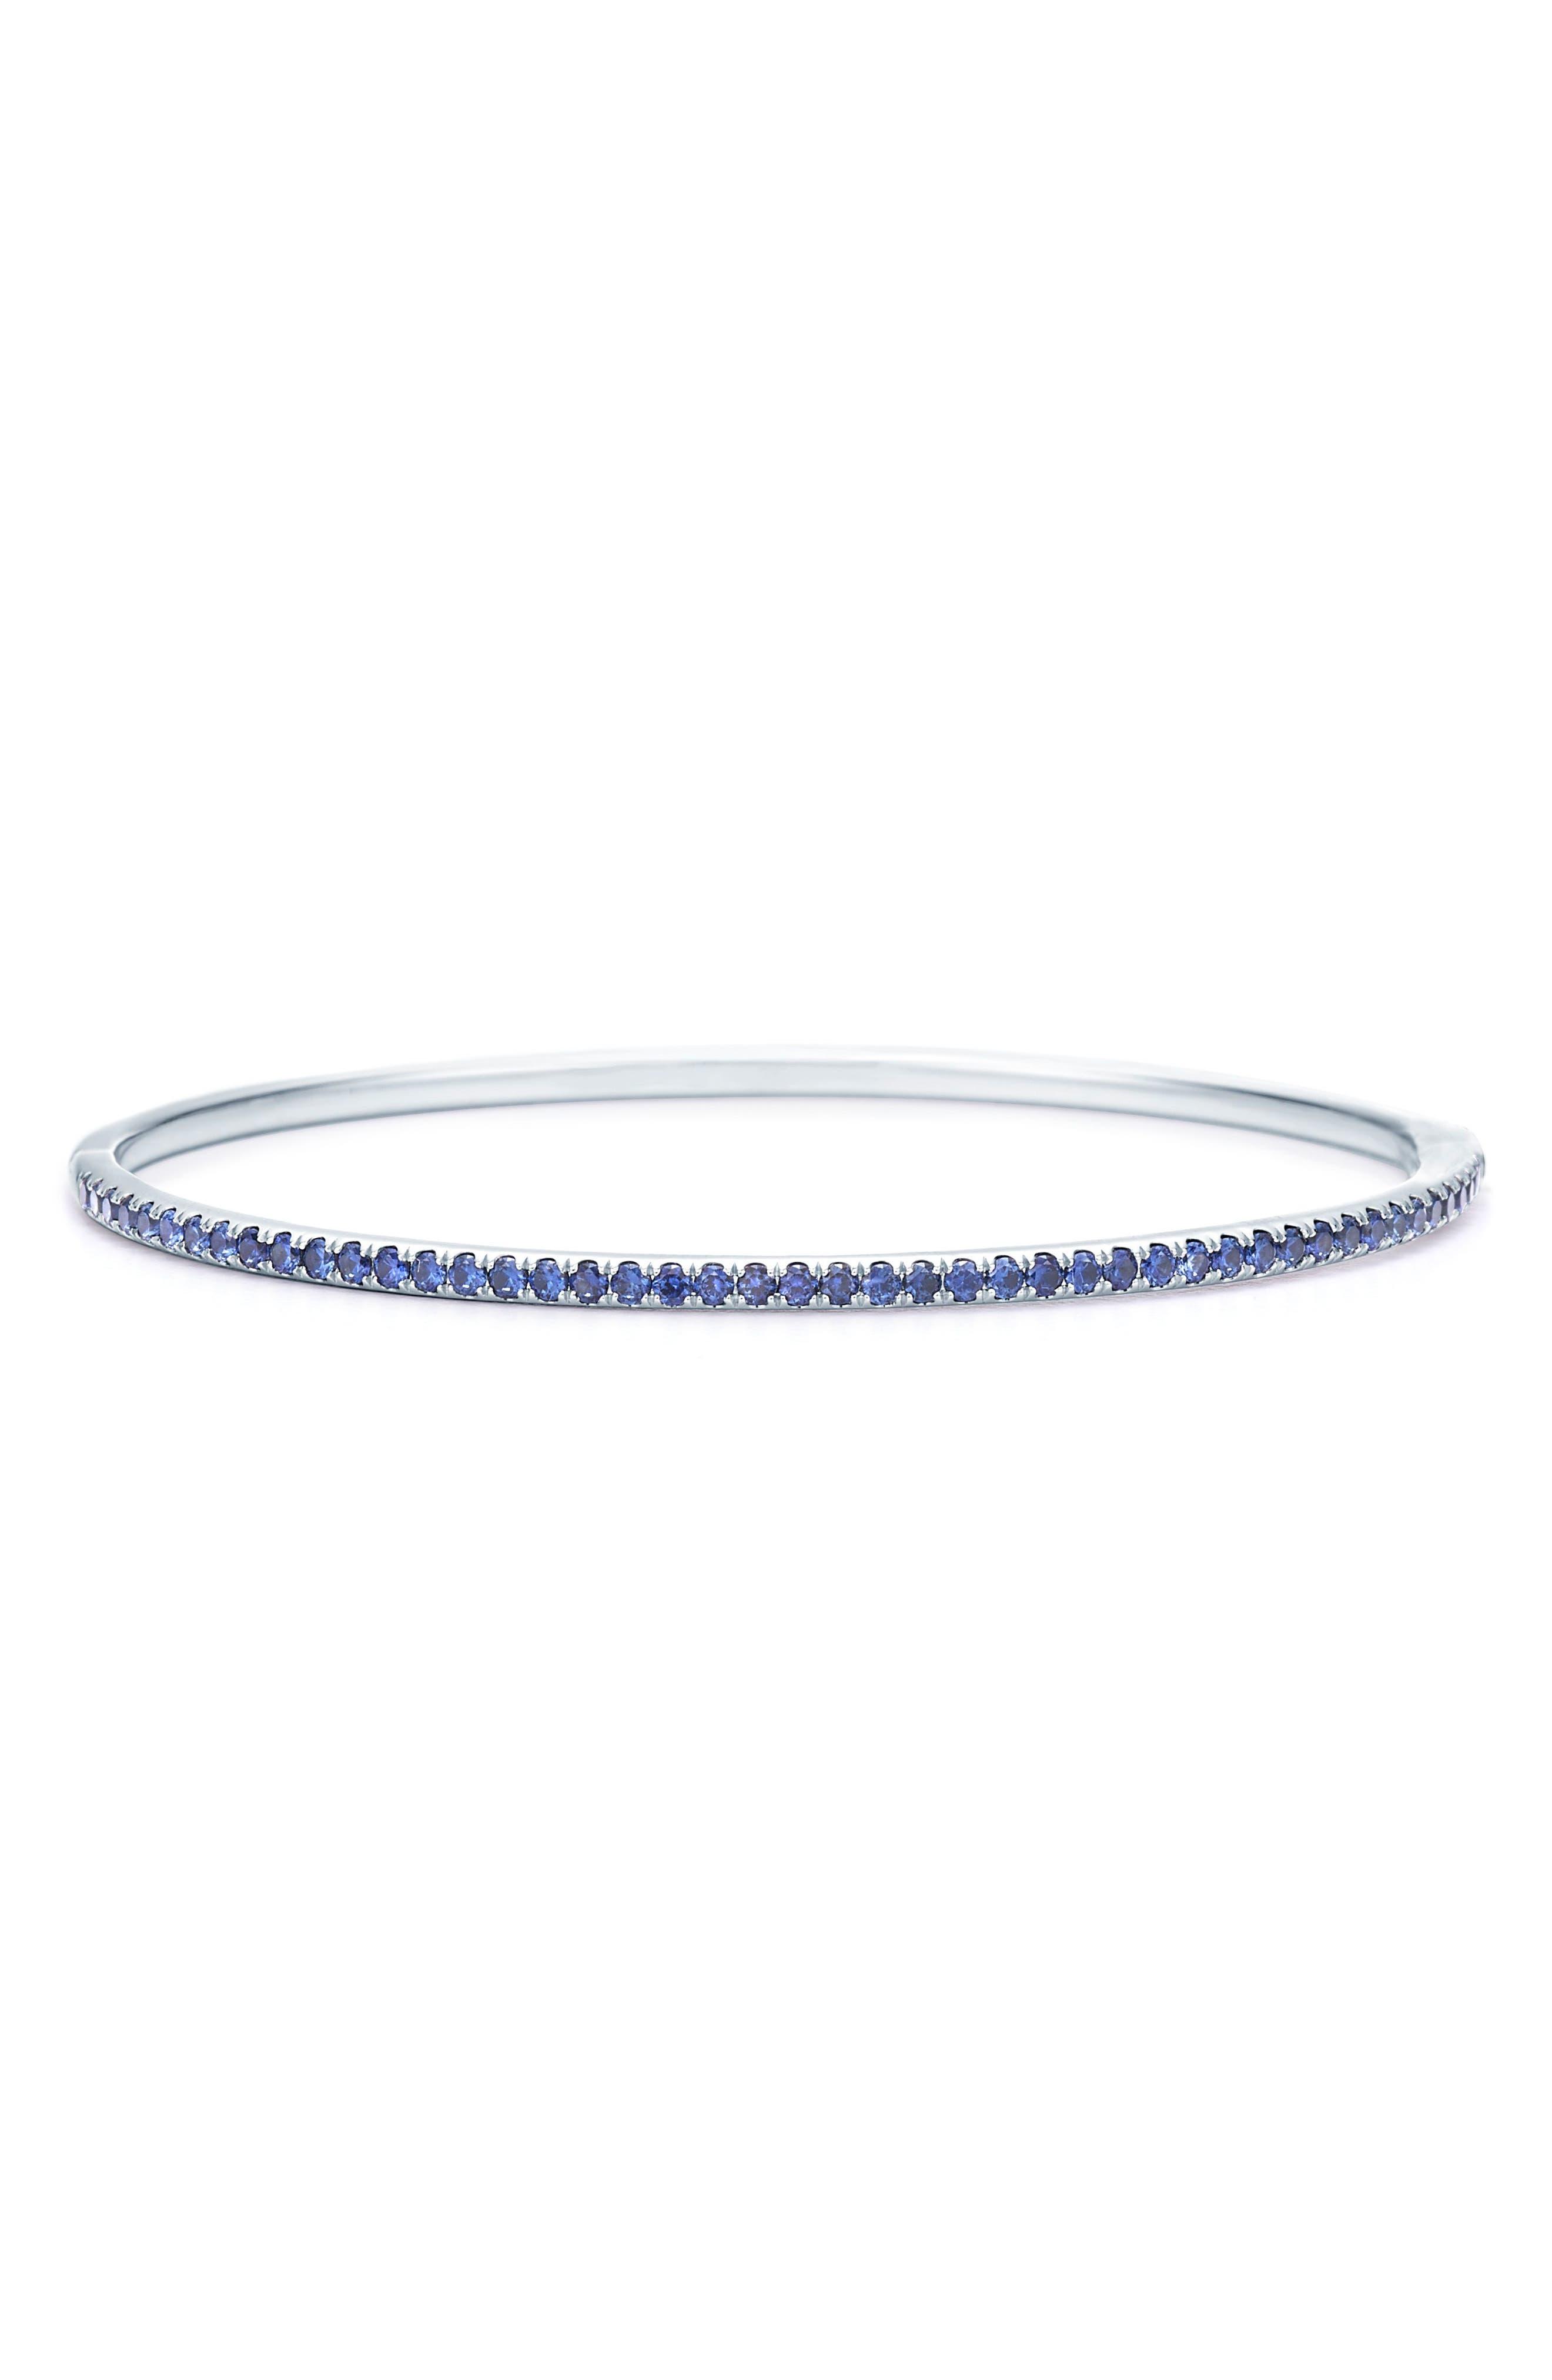 Sapphire Stacking Bracelet,                             Main thumbnail 1, color,                             WHITE GOLD